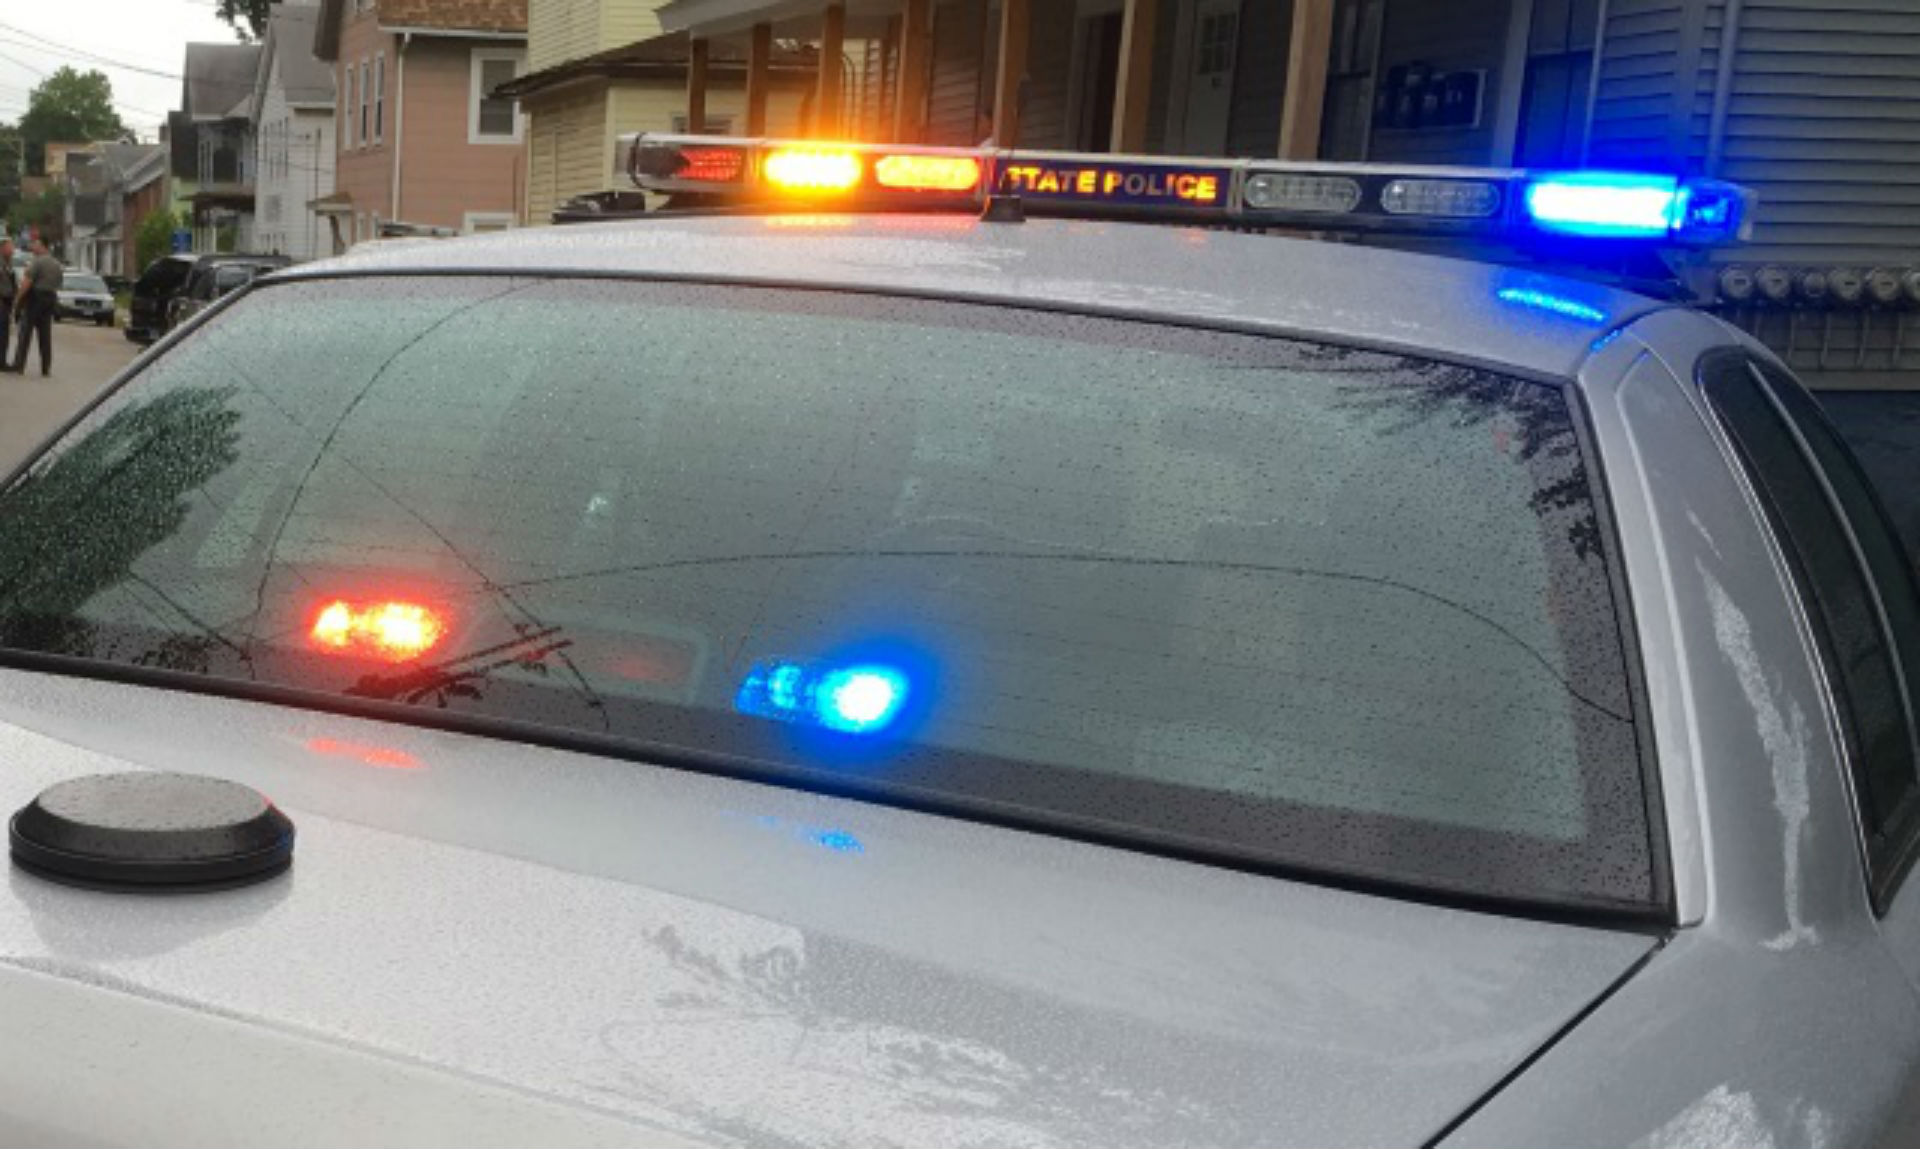 state-police-cruiser-generic-day_1522171946268.jpg